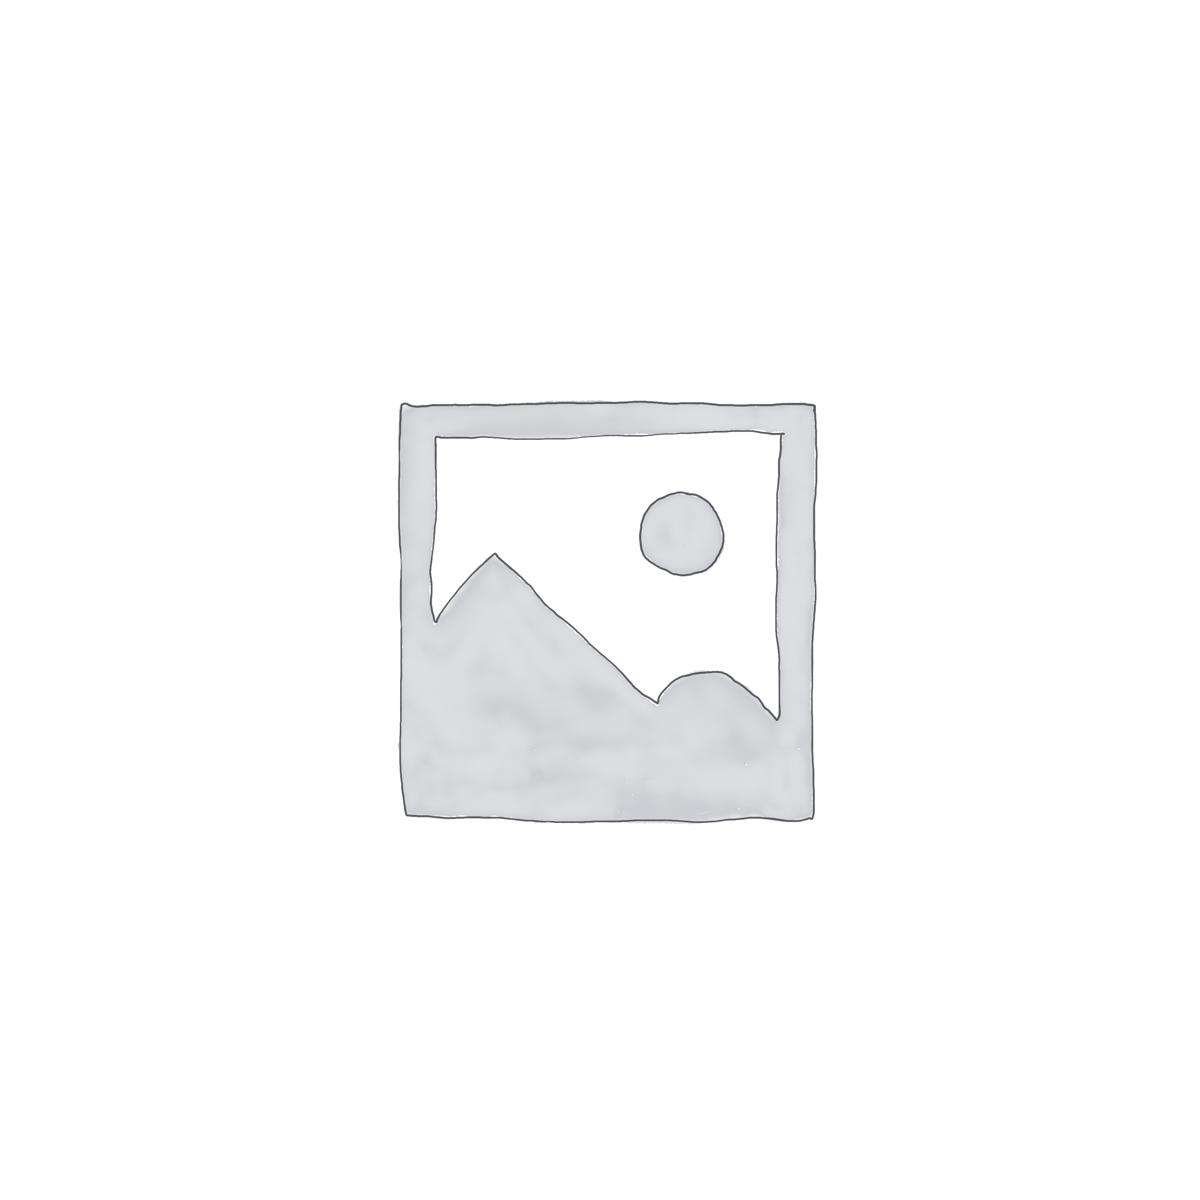 3D Embossed Look Rose Flower Wallpaper Mural